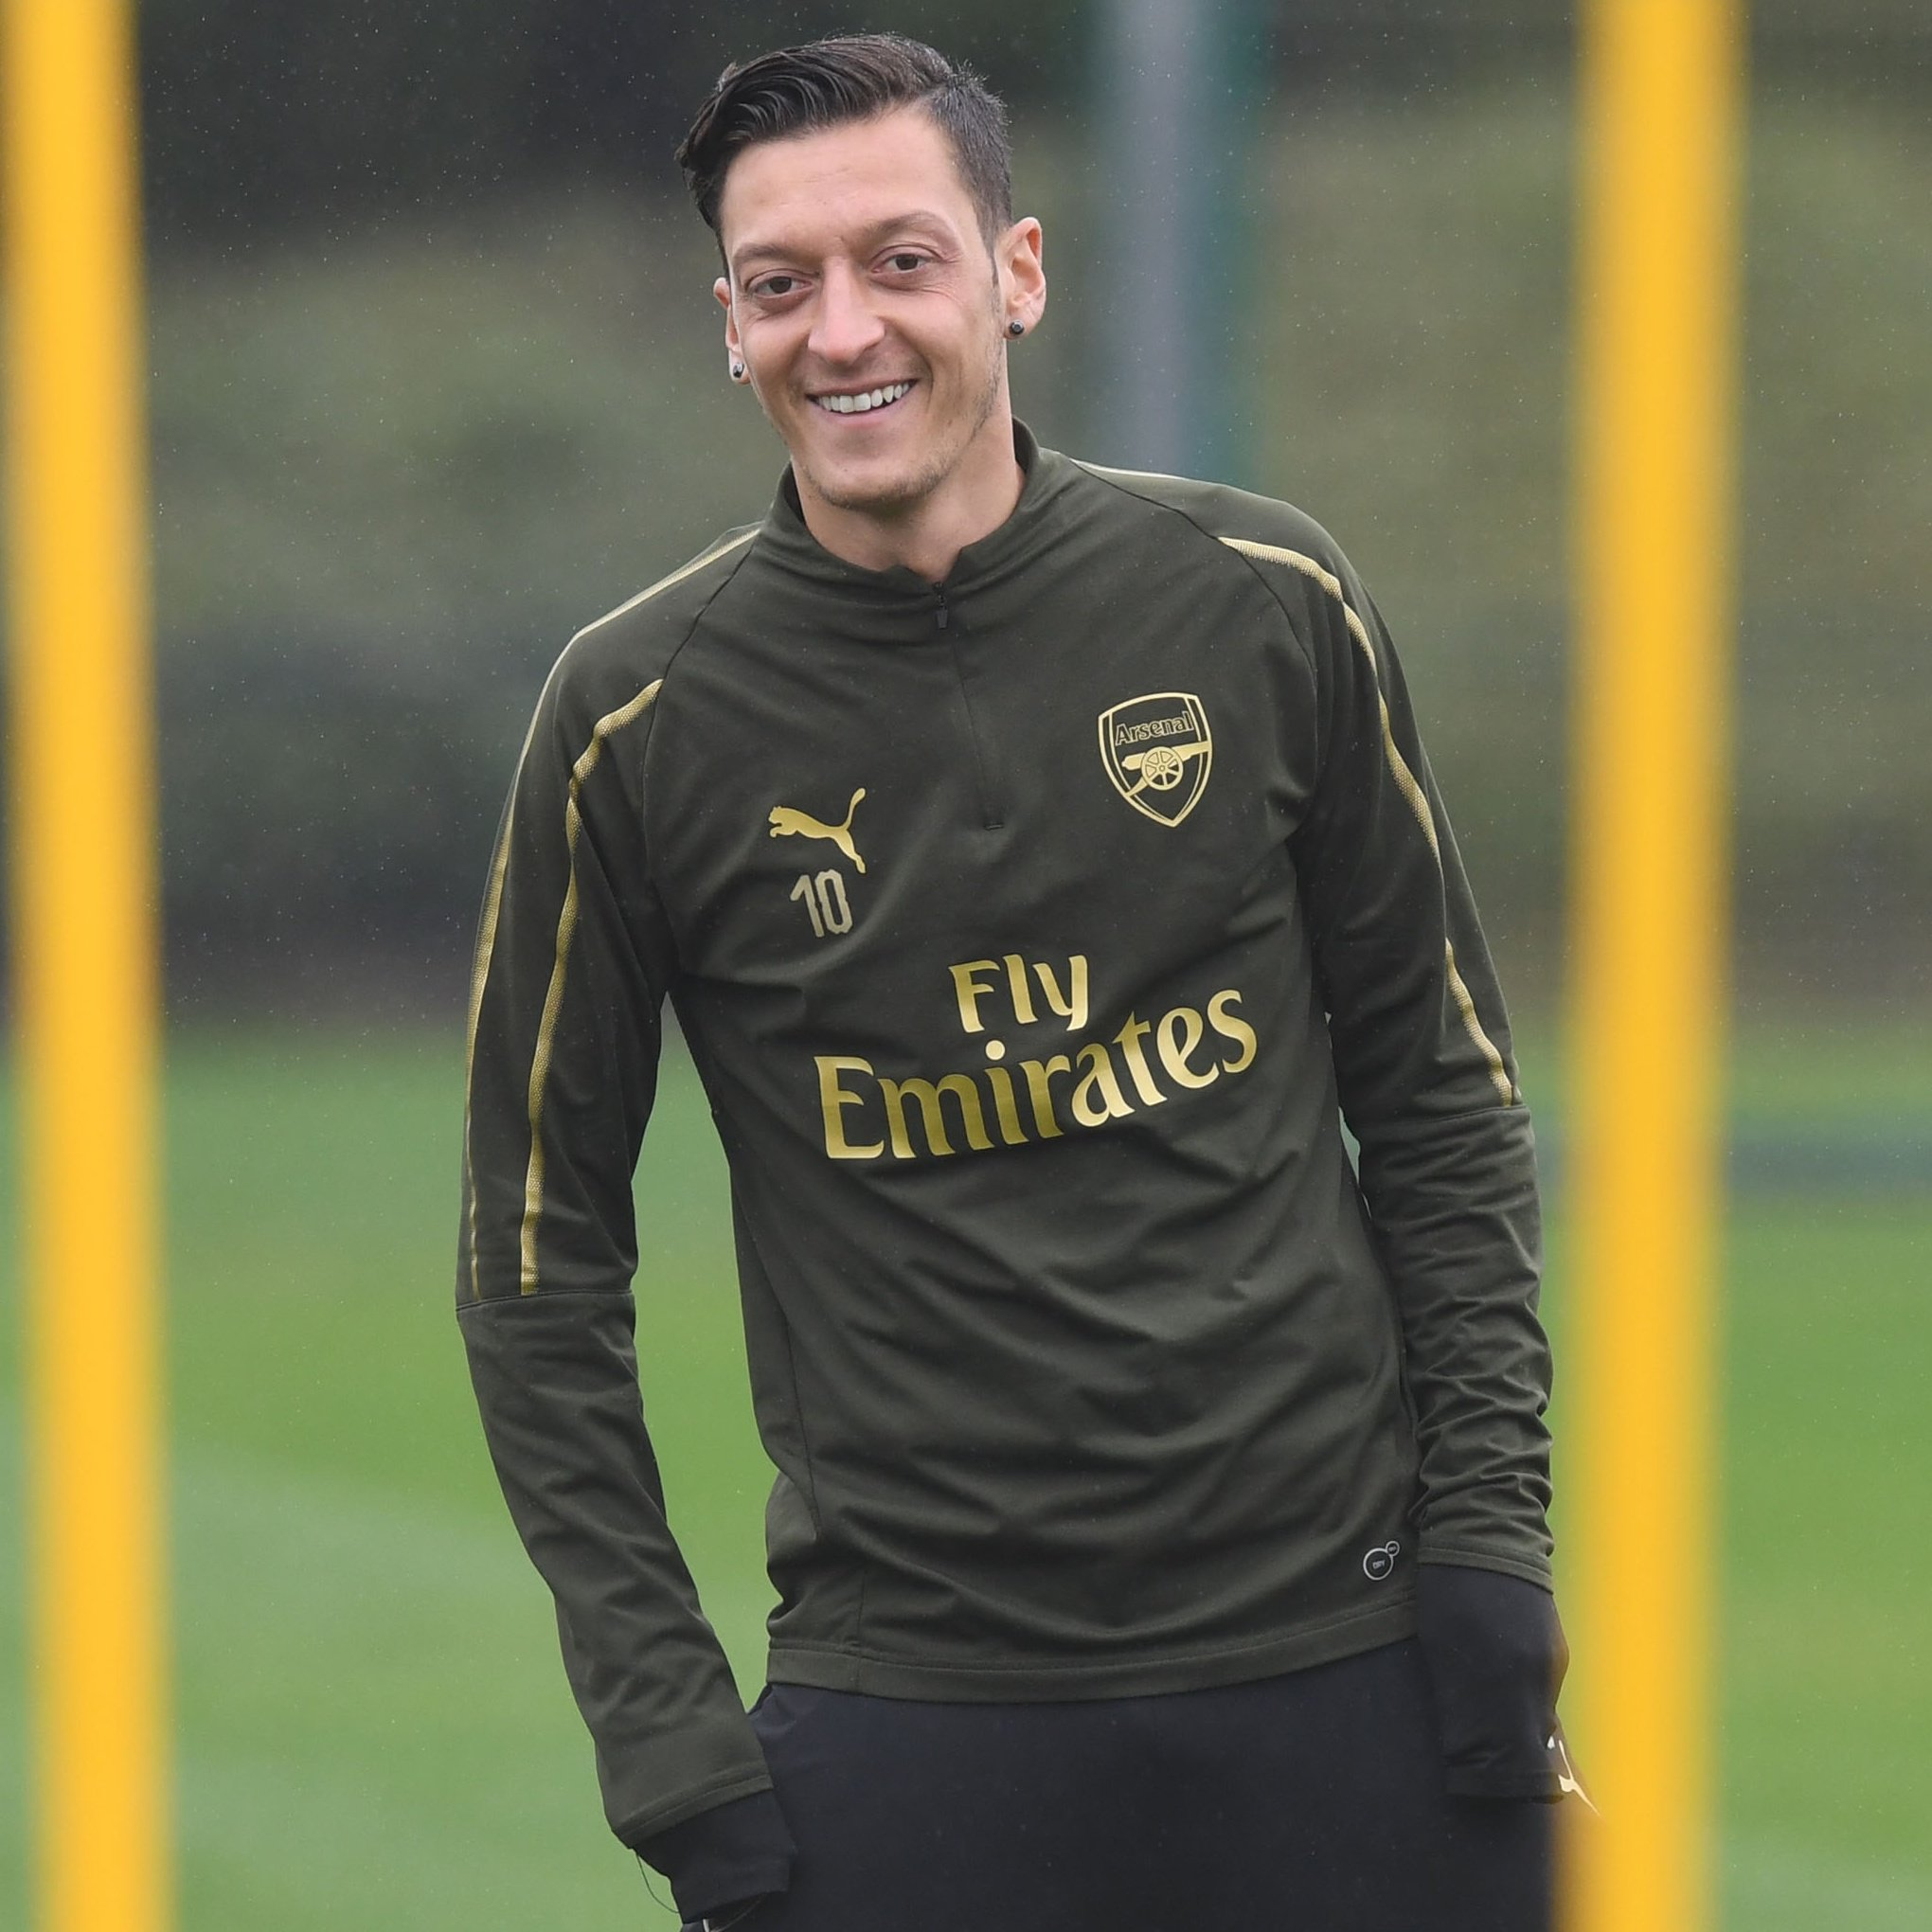 �� We've got Ozil... Mesut Ozil! ��  〽️ @MesutOzil1088 #M1Ö https://t.co/vKXjqdvUT8